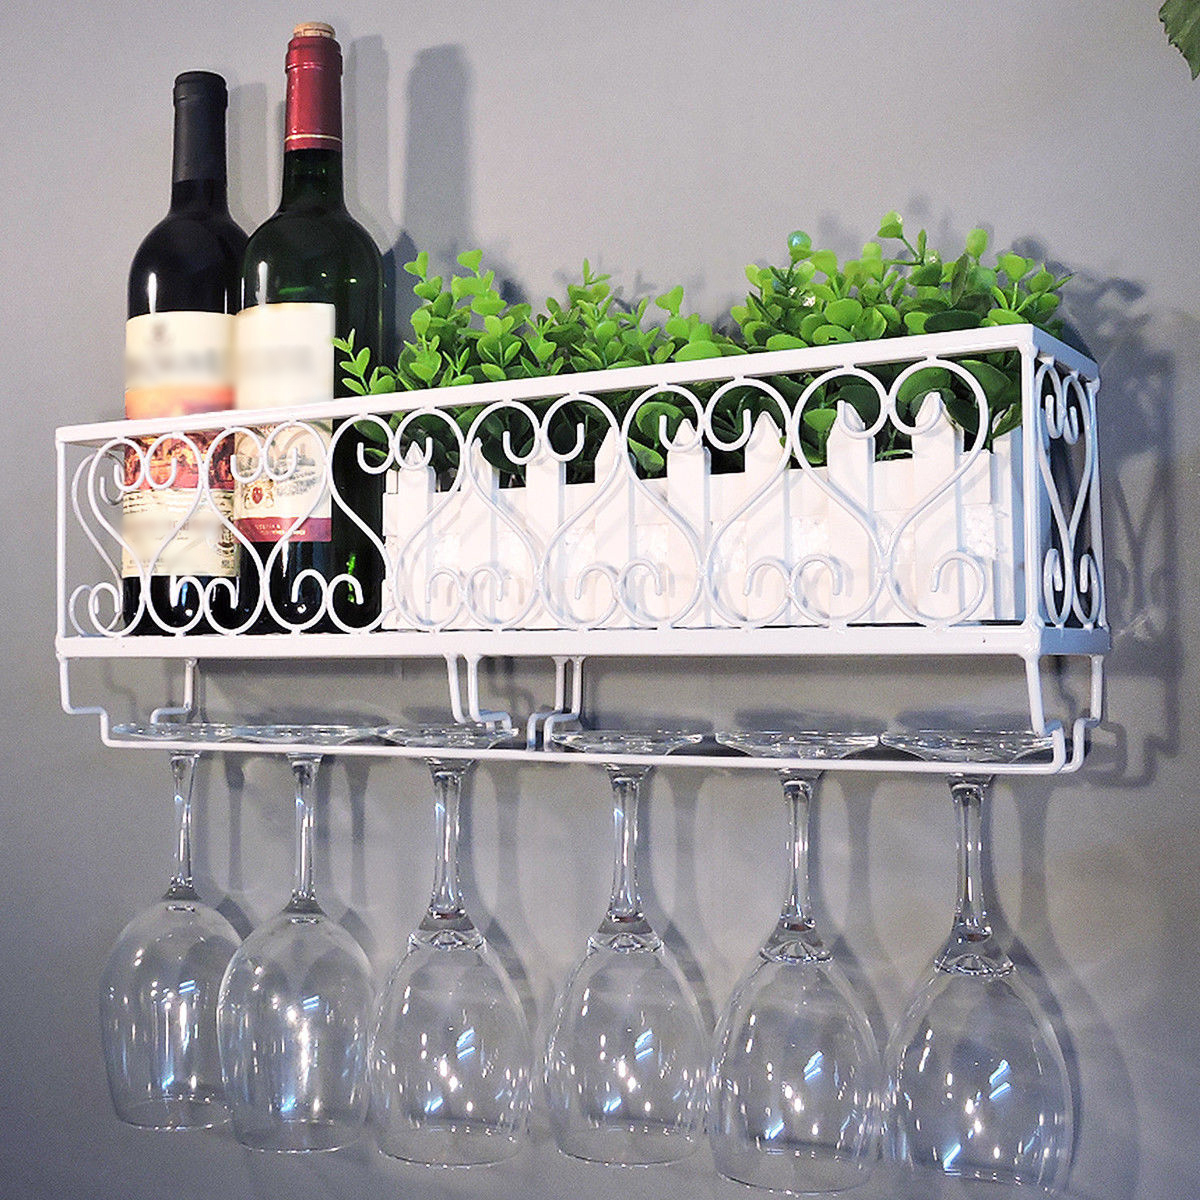 Wall Mount Metal Wine Rack Bottle Shelf With Gl Holder Home Bar Decor